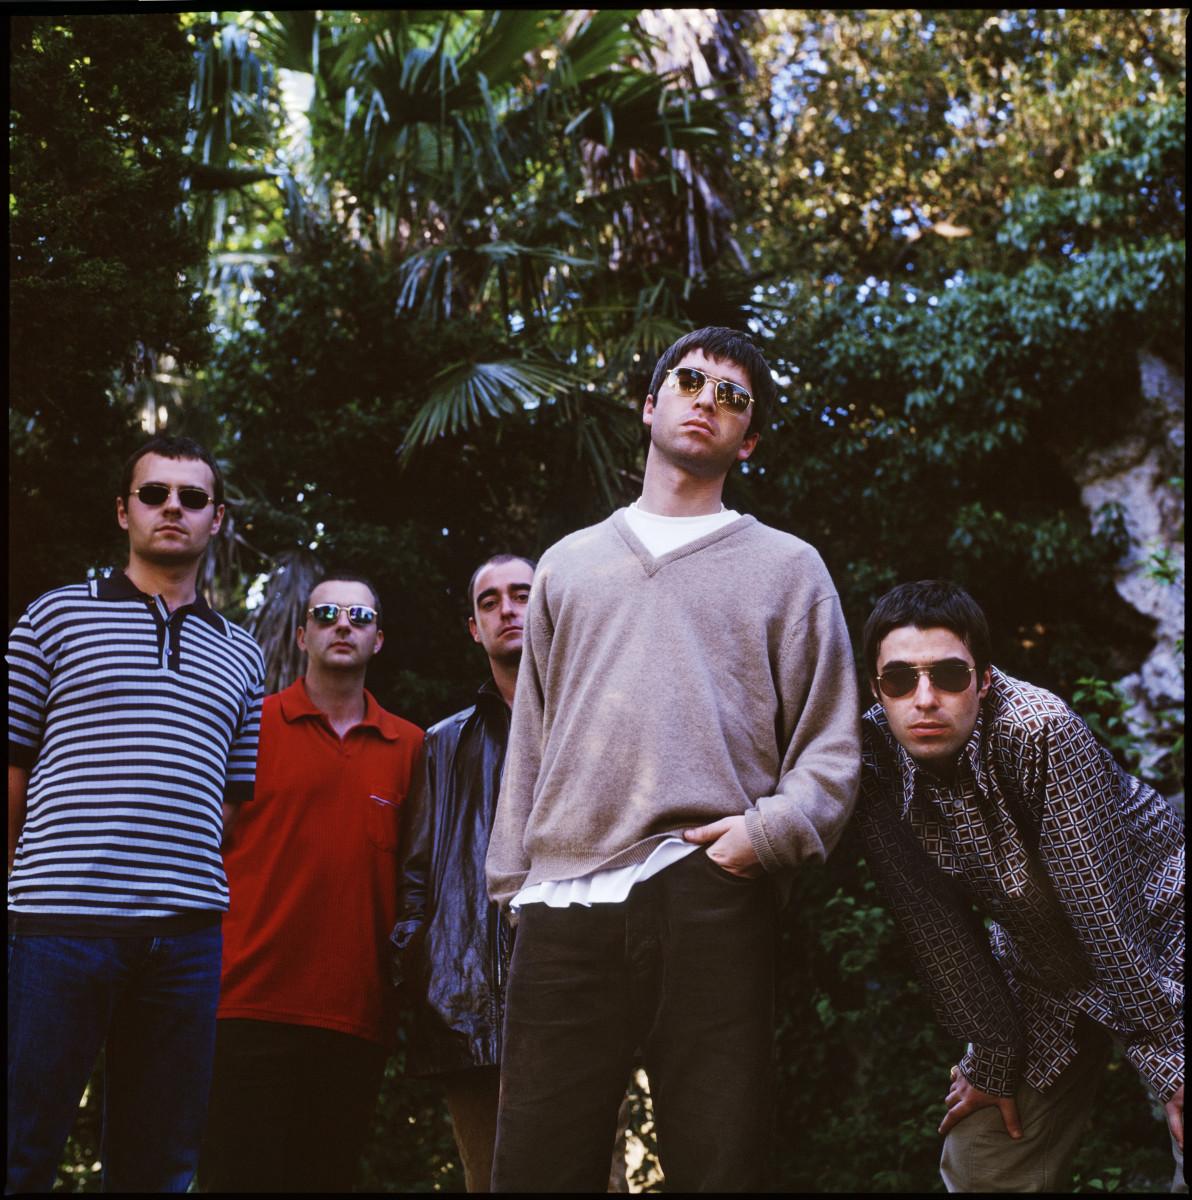 Oasis pictured in London in 1997. (Photo by Jill Furmanovsky)